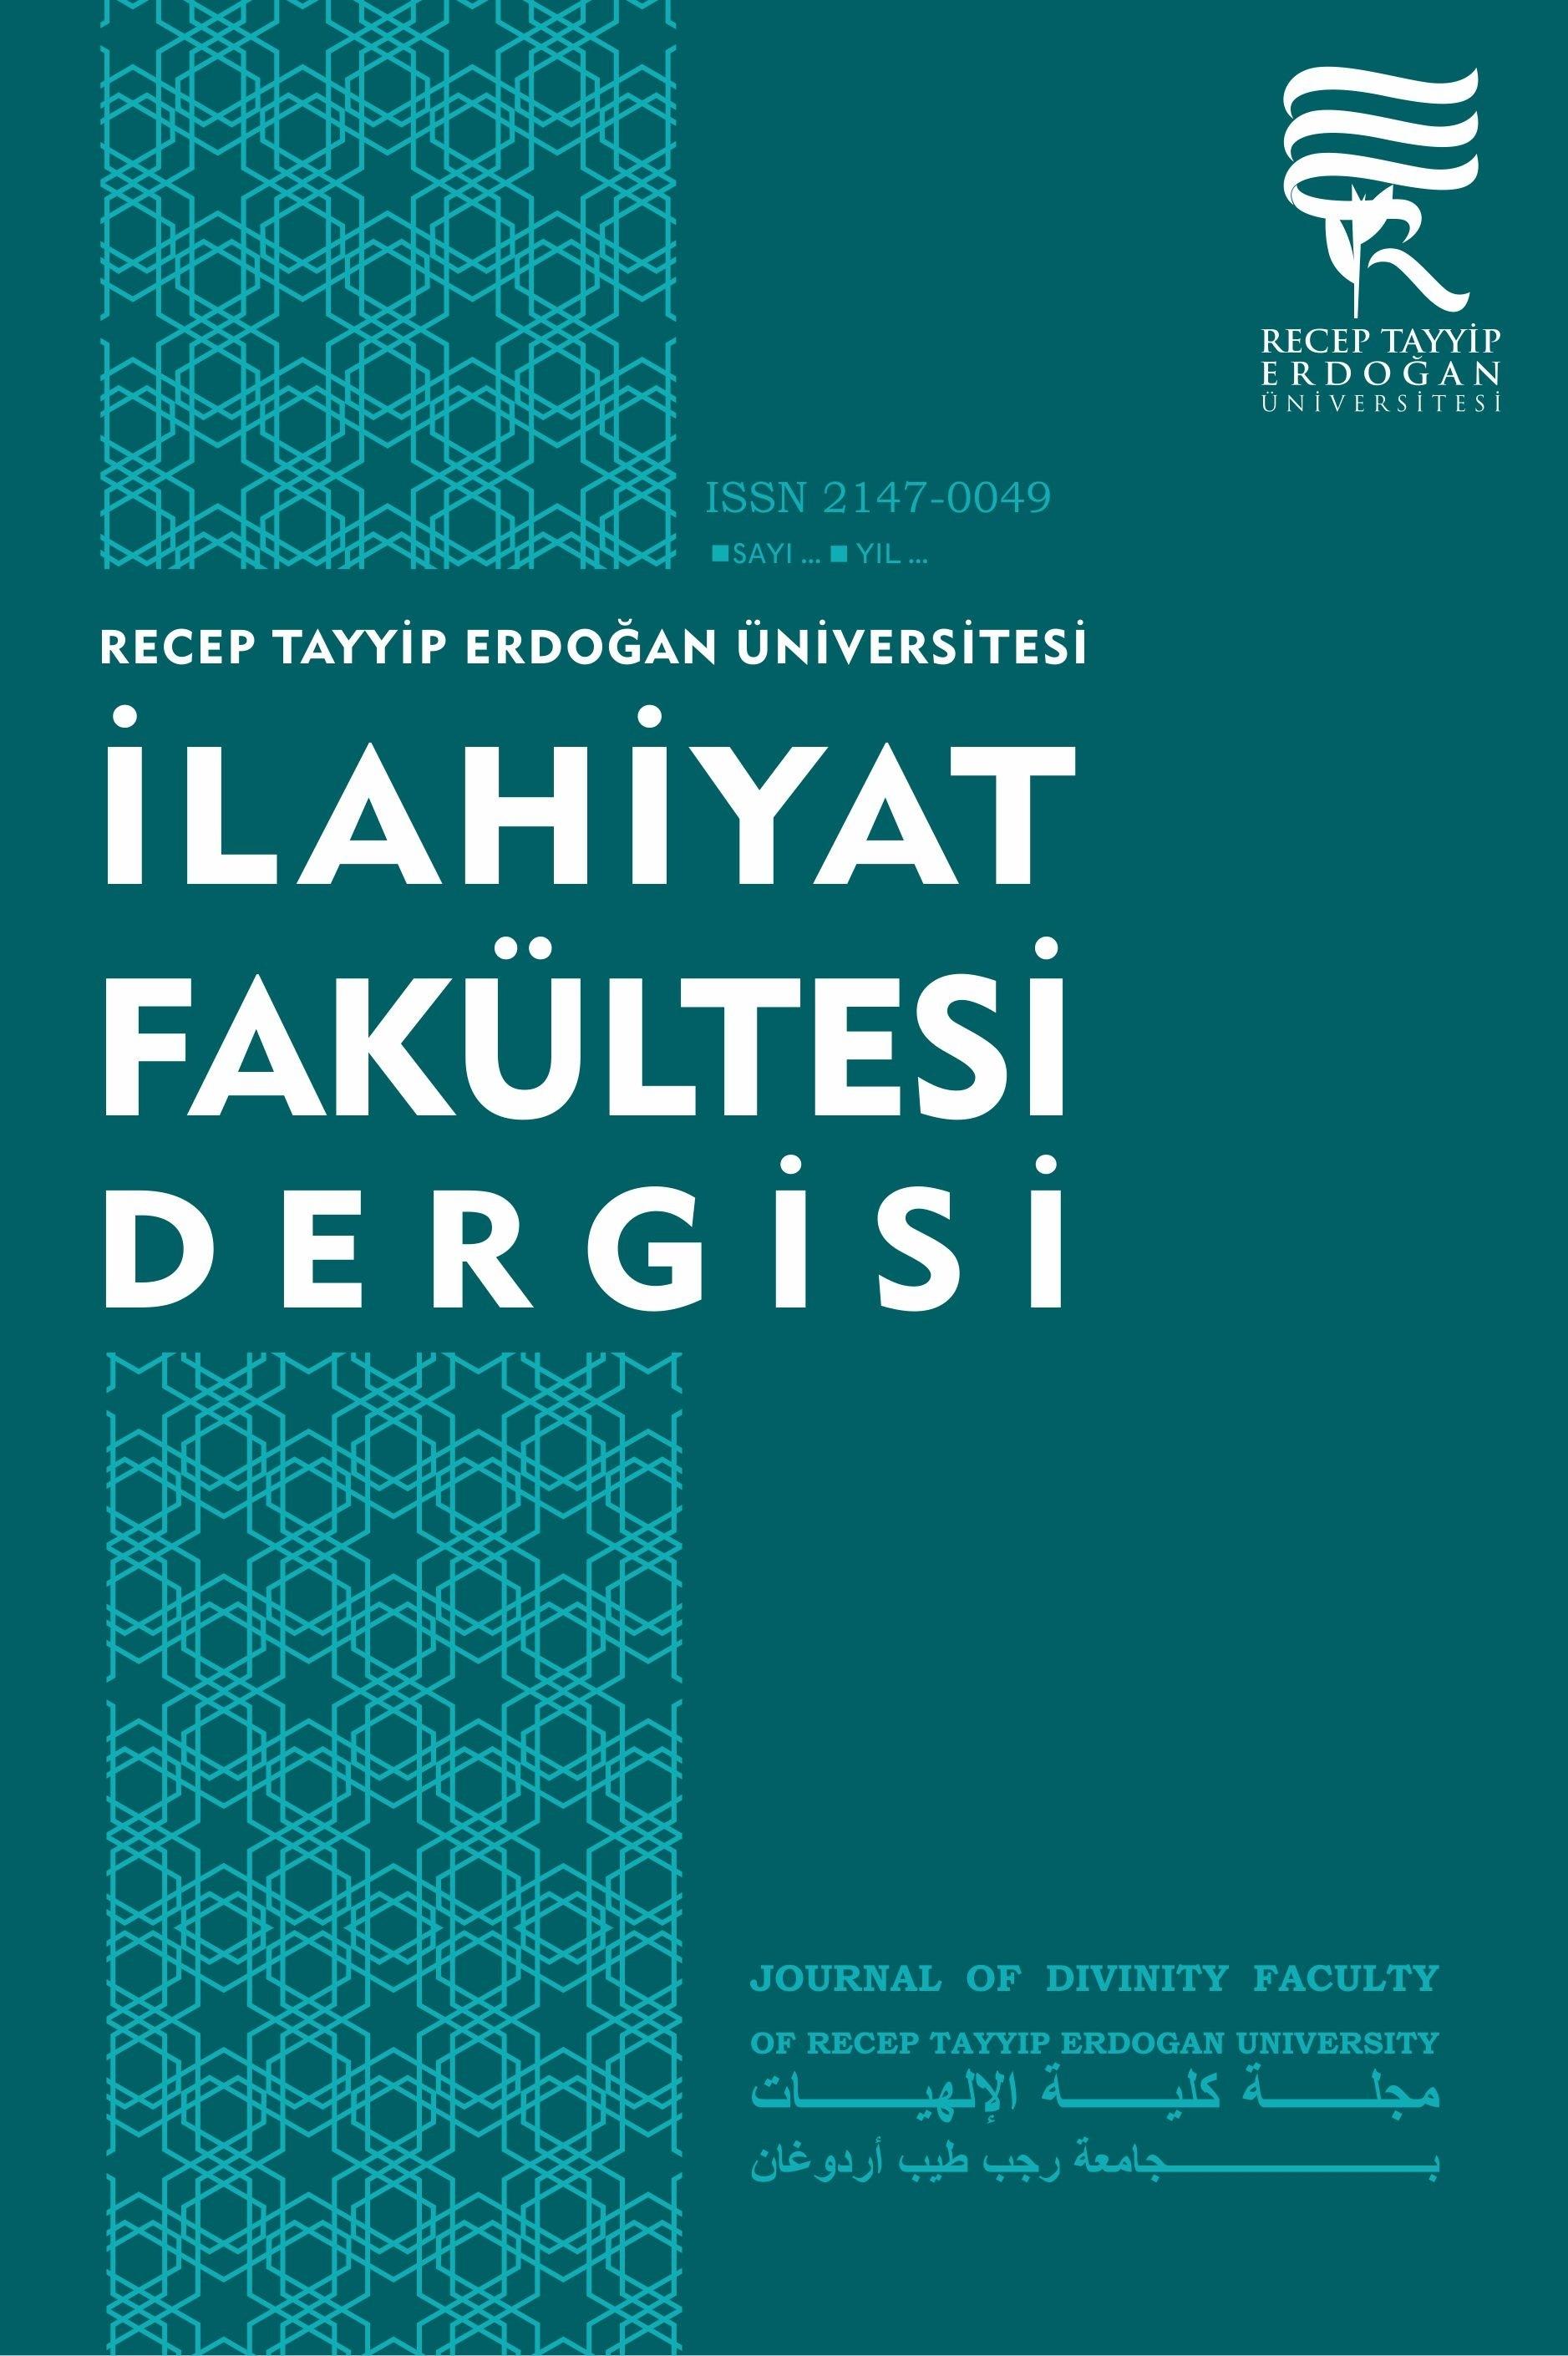 Journal of Divinity Faculty of Recep Tayyip Erdogan University